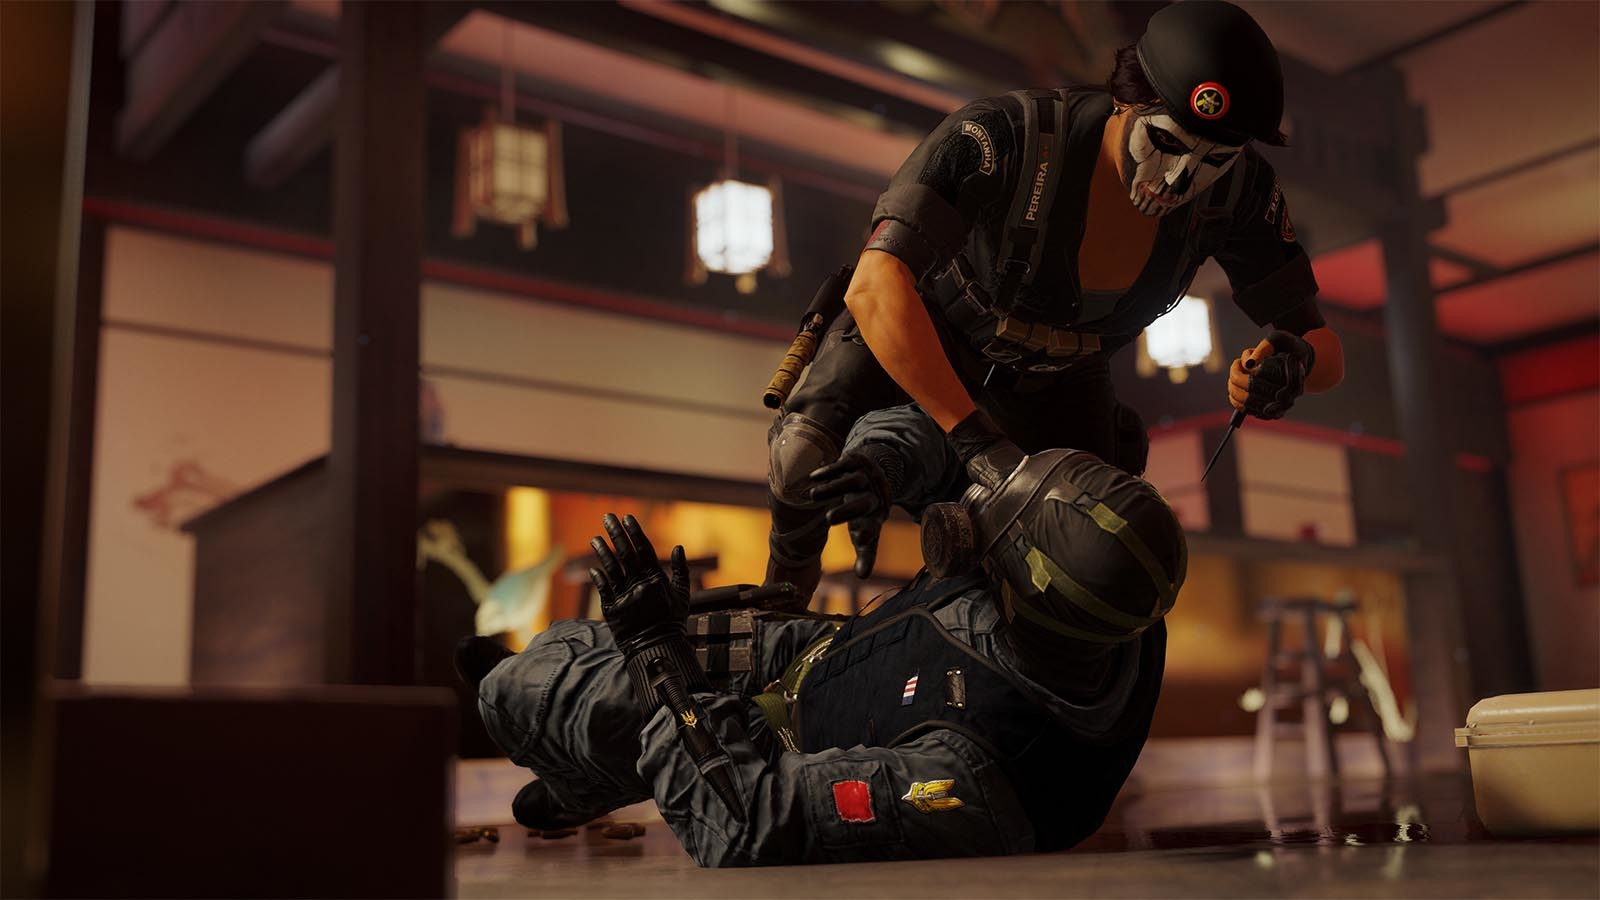 rainbow six siege advanced edition features